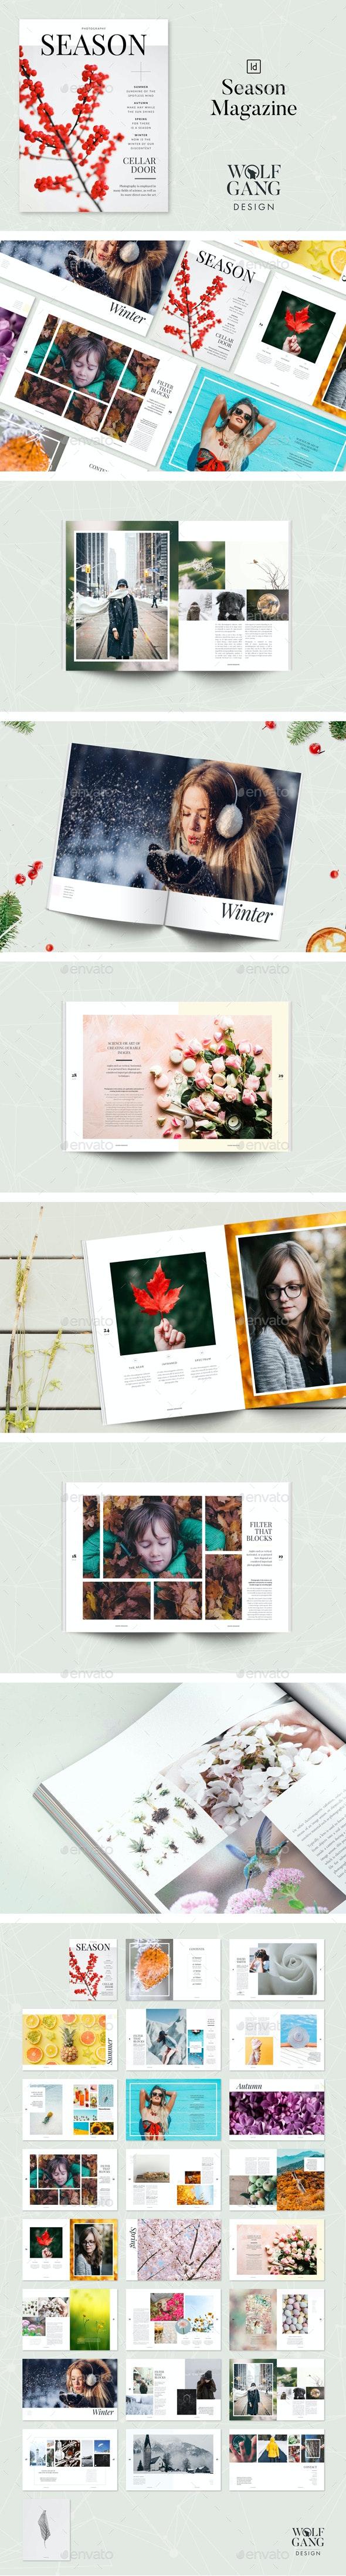 Season Magazine Template - Magazines Print Templates